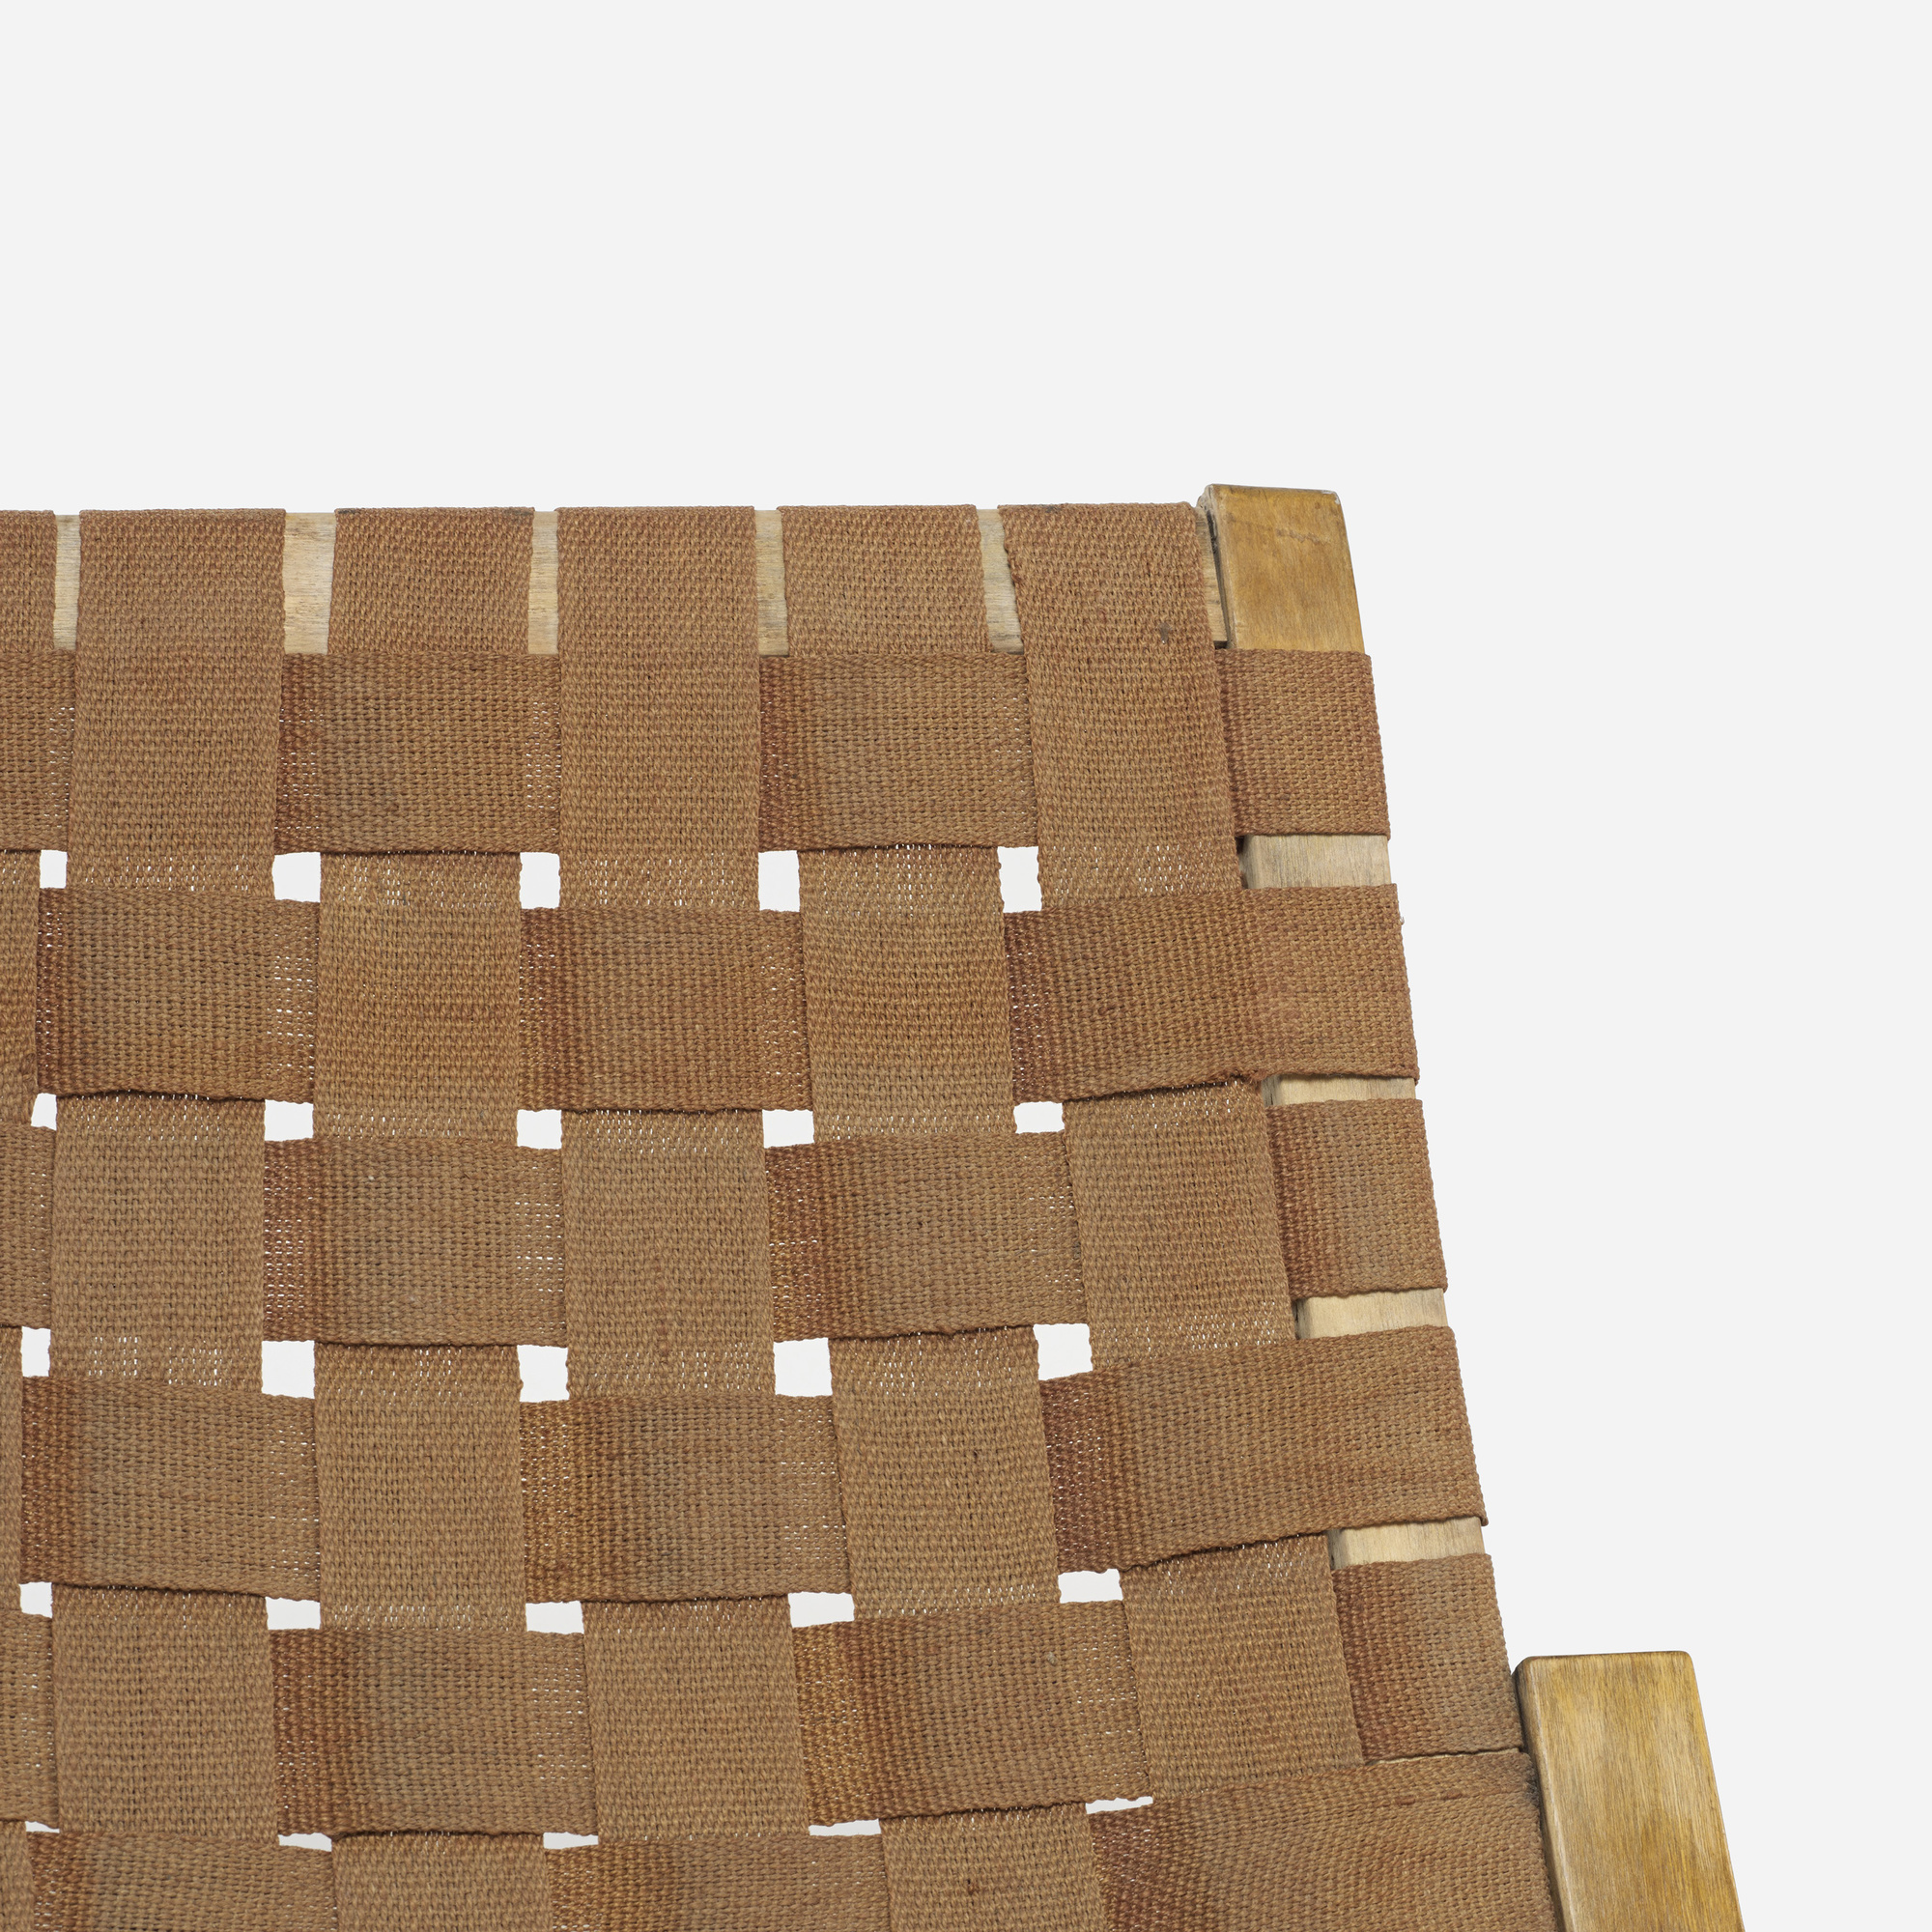 329 alvar aalto cantilevered chaise model 39 for Chaise alvar aalto